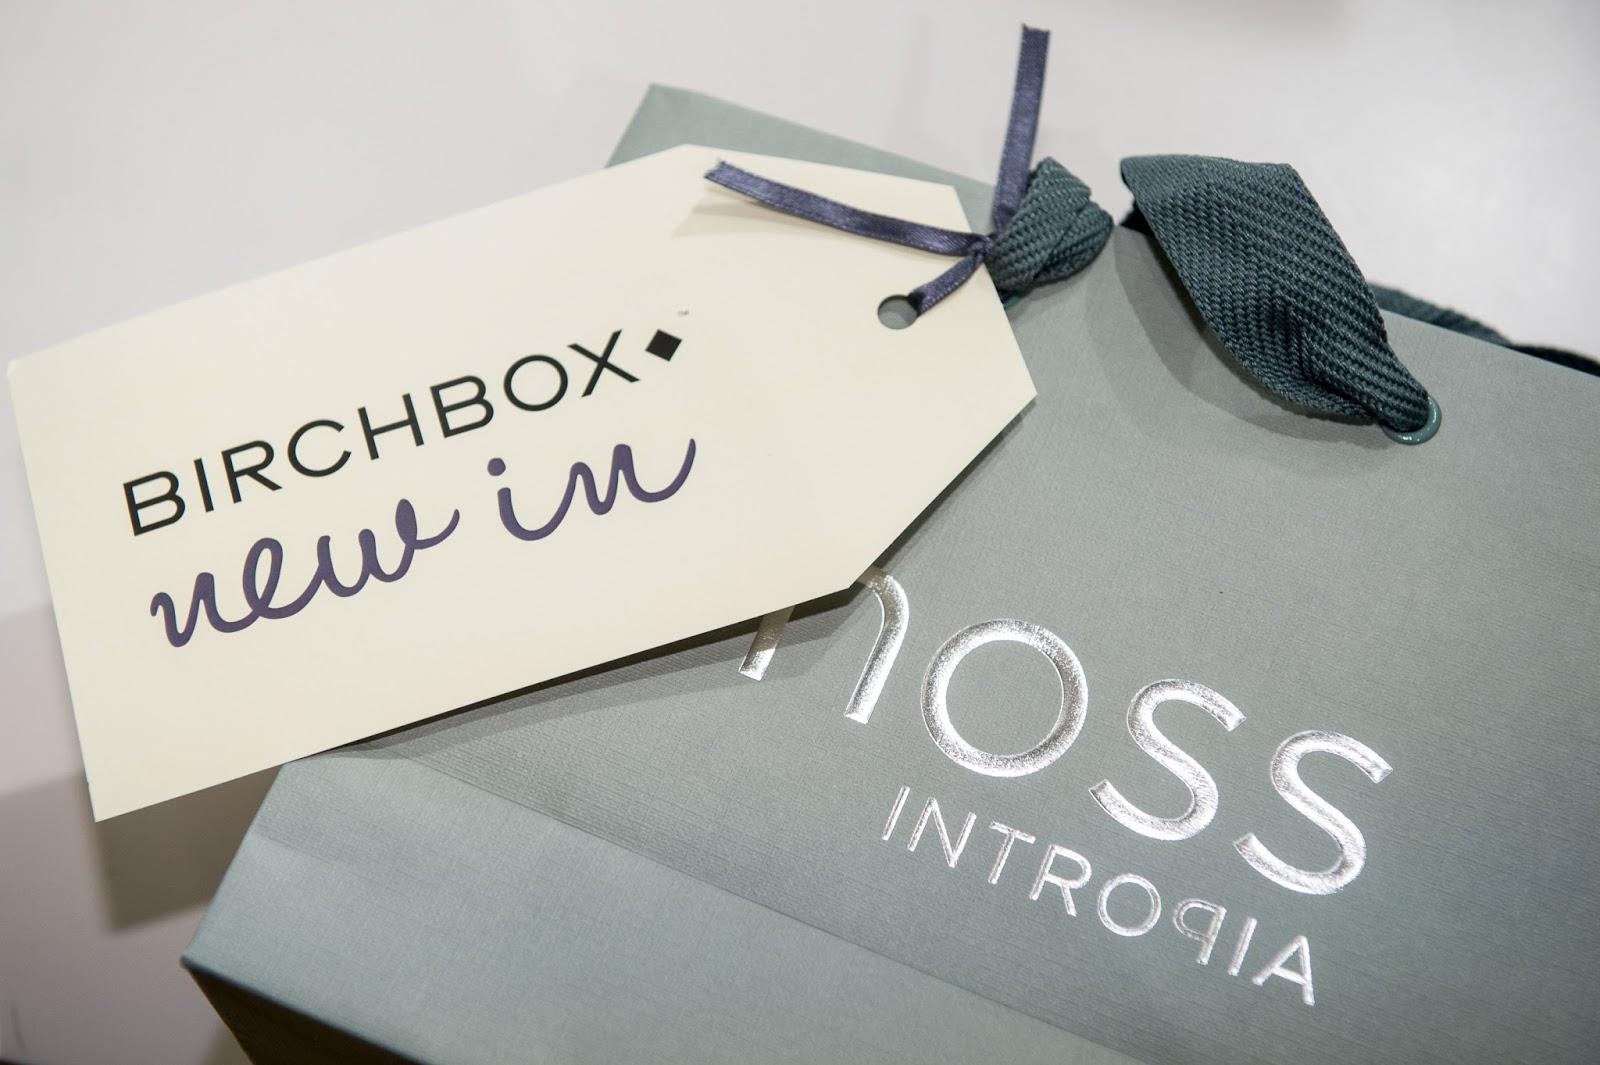 Birchbox+HossIntropia=New In